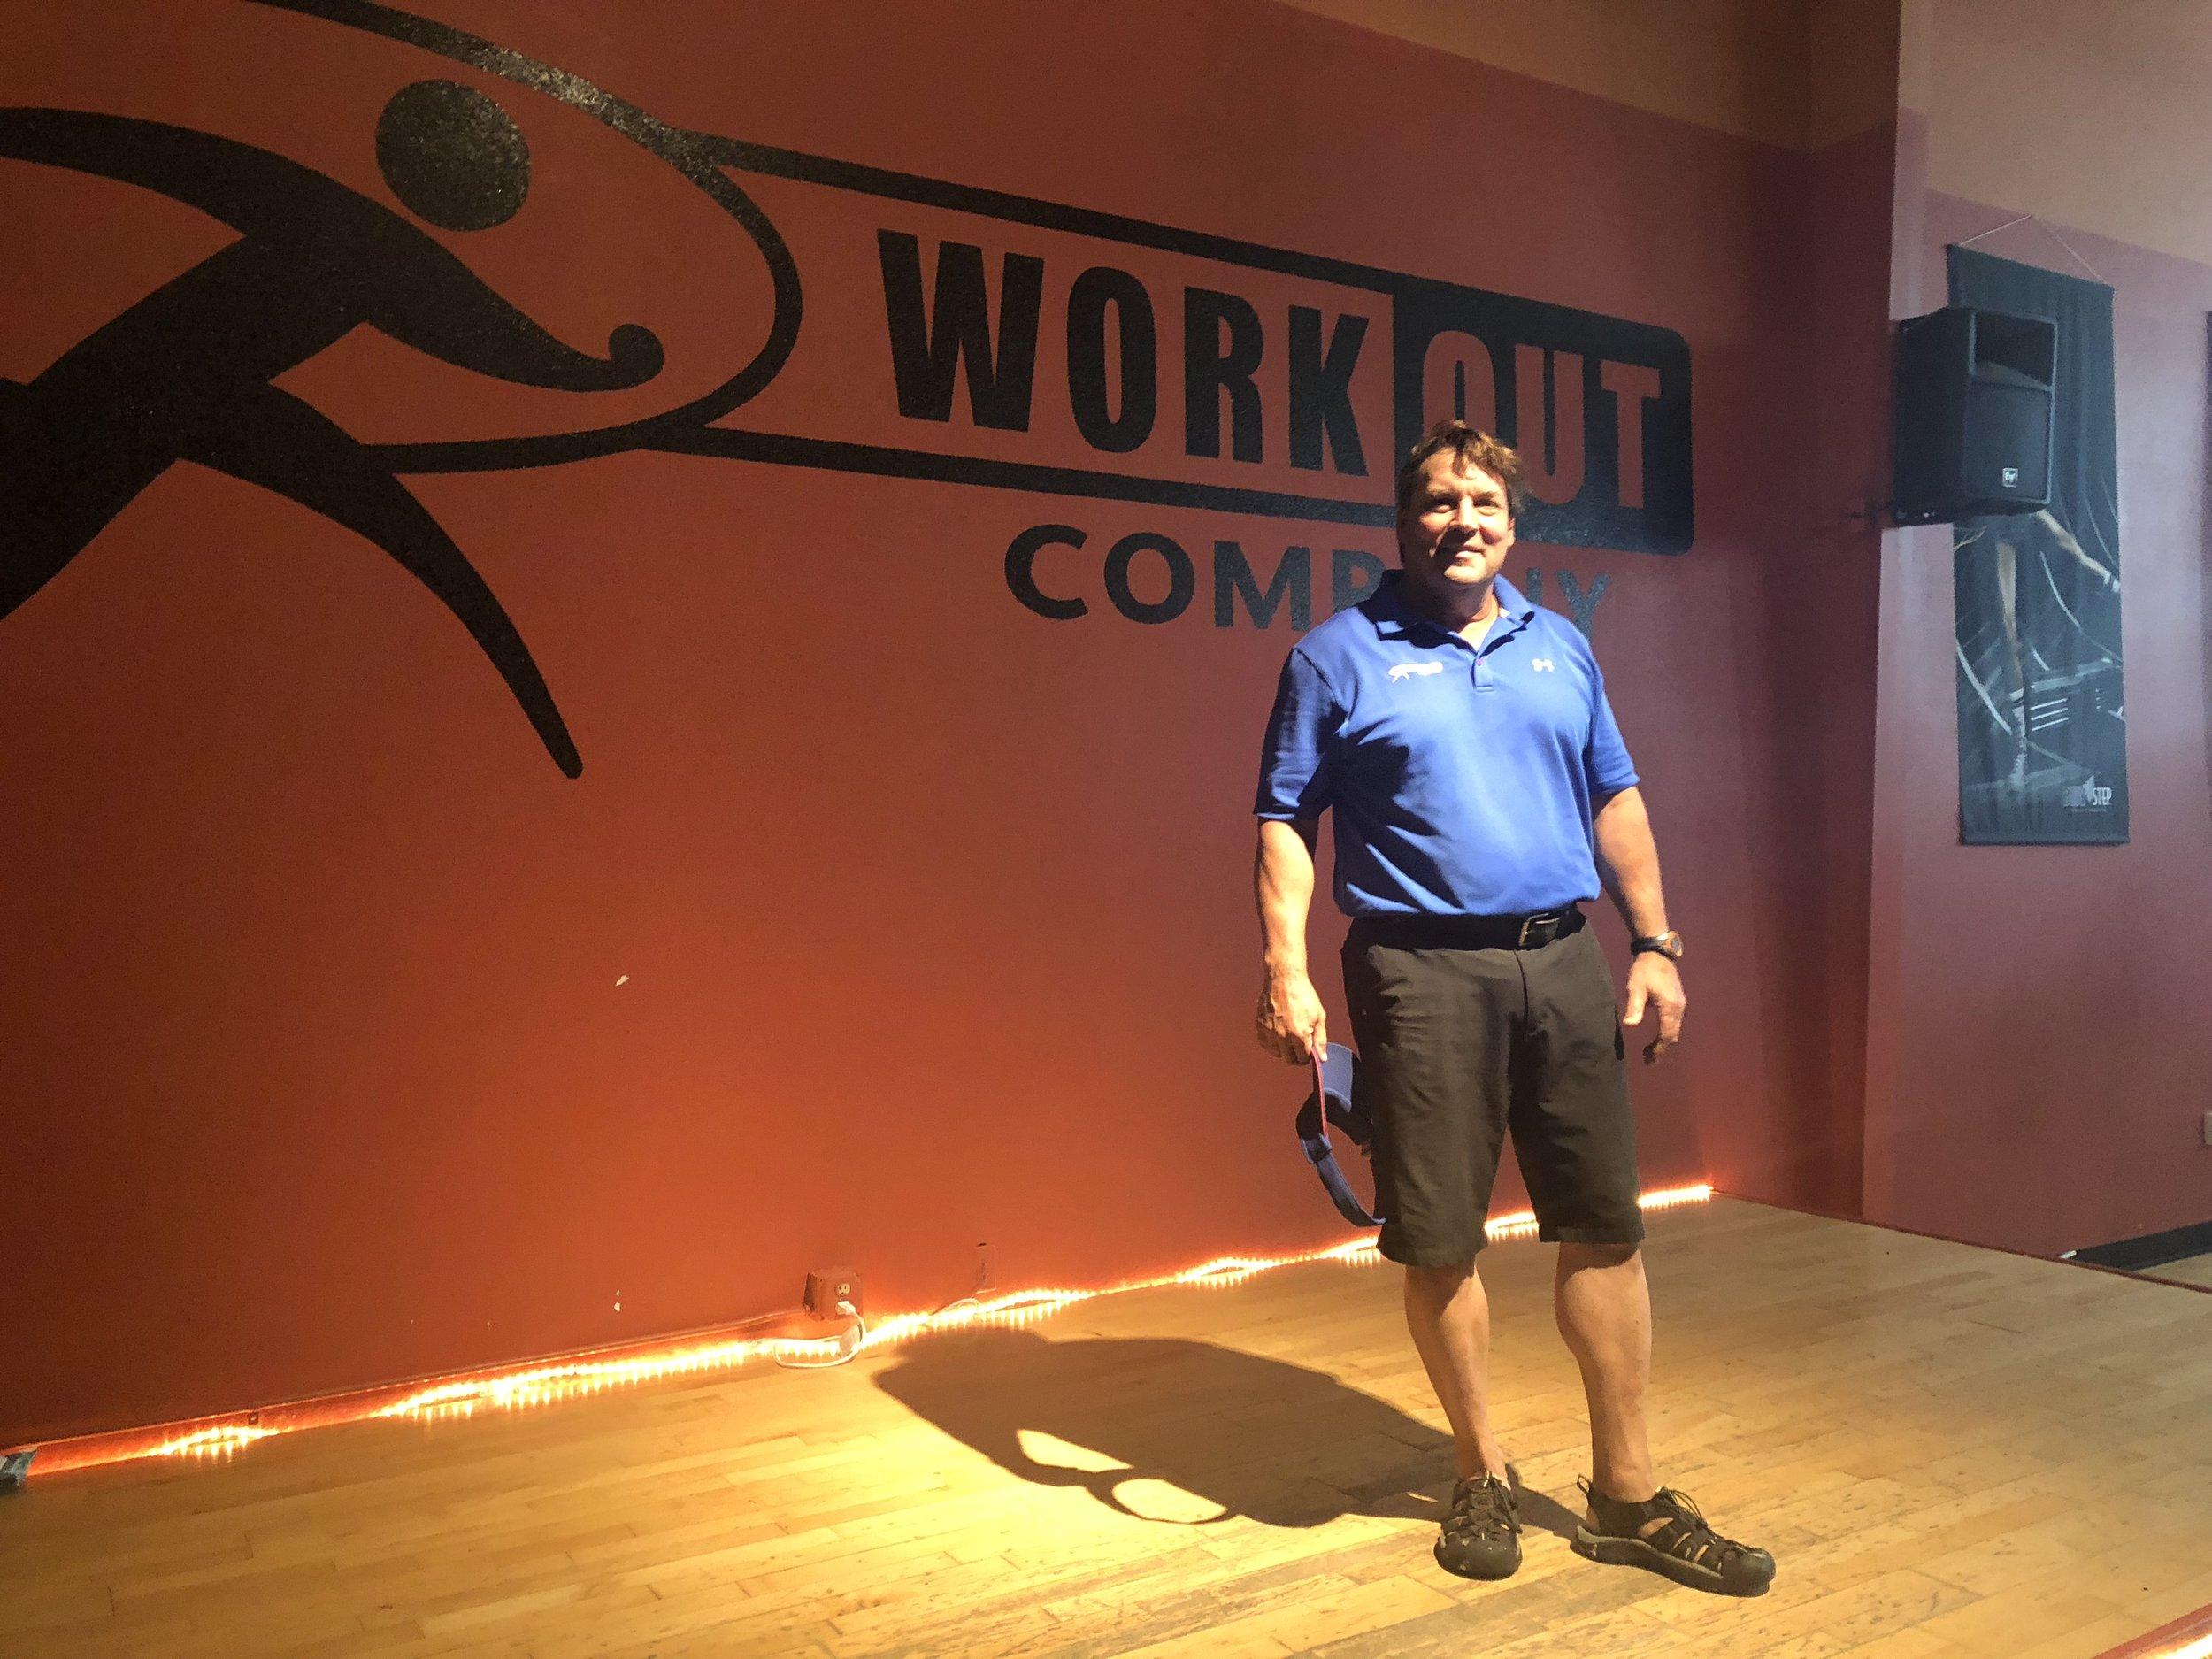 The Workout Company's Owner Carl Clover (Photo: Erik Prenzler/AdaptBN)